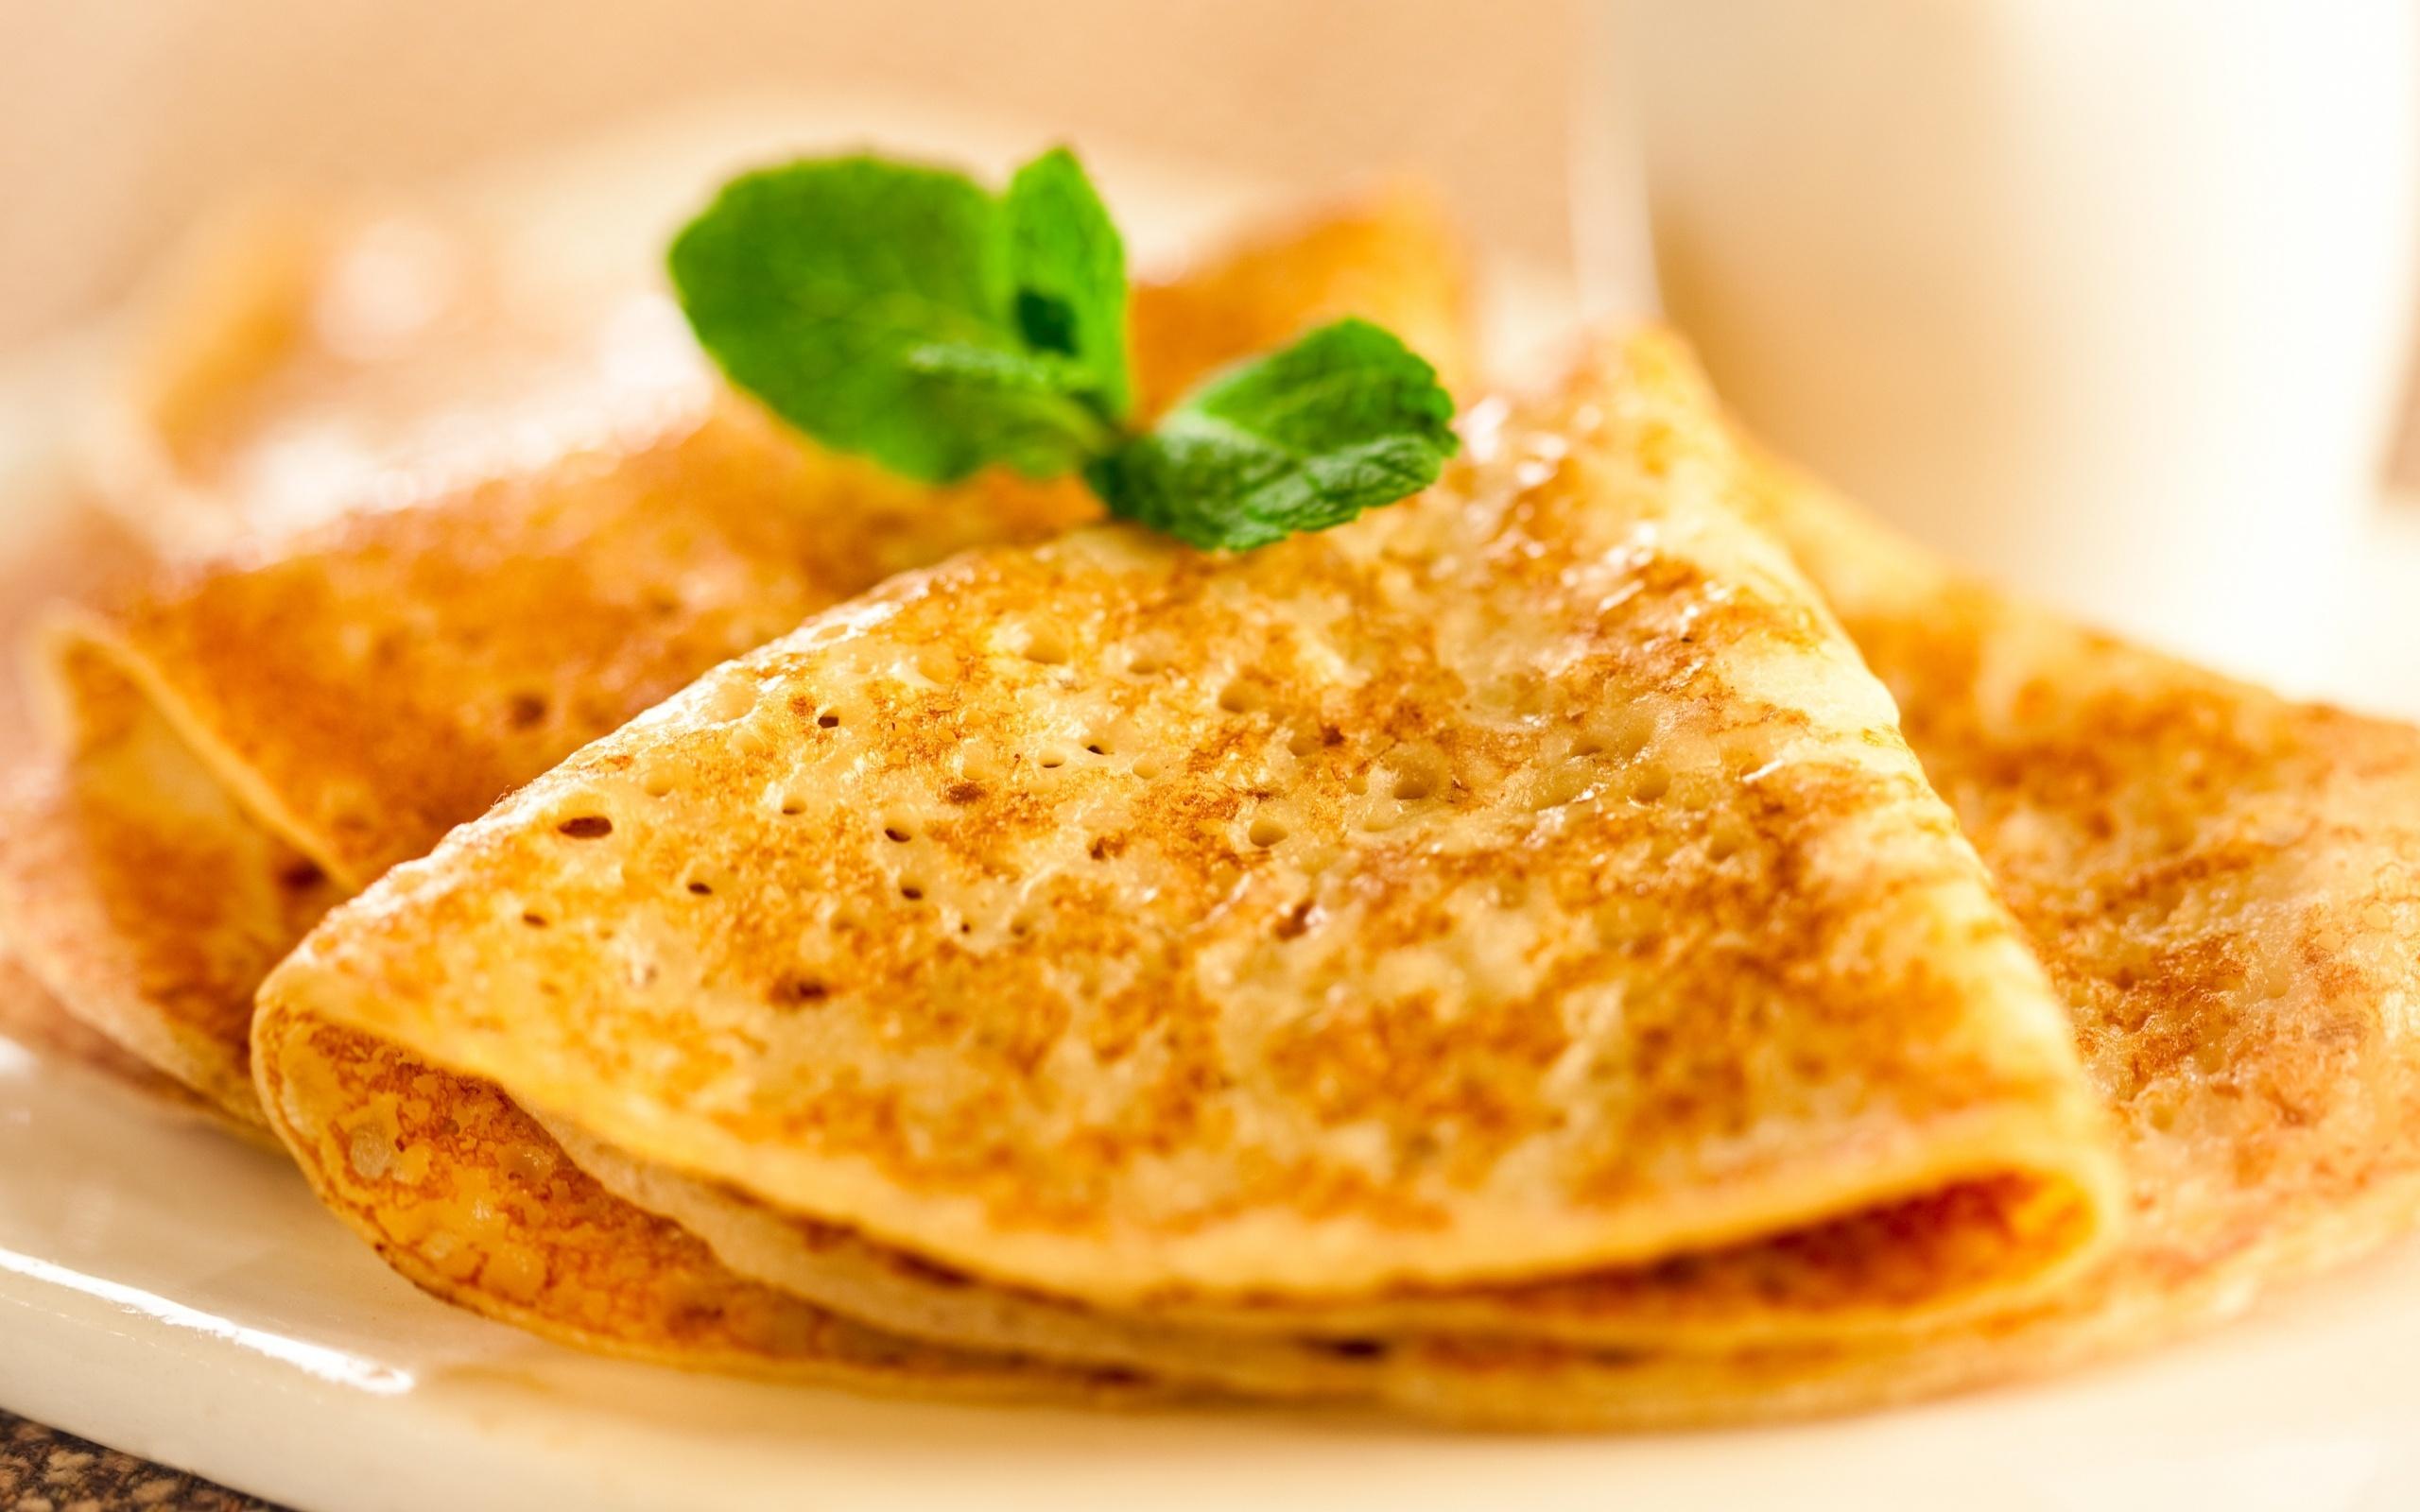 54d738410e00e_pancakes-wallpaper